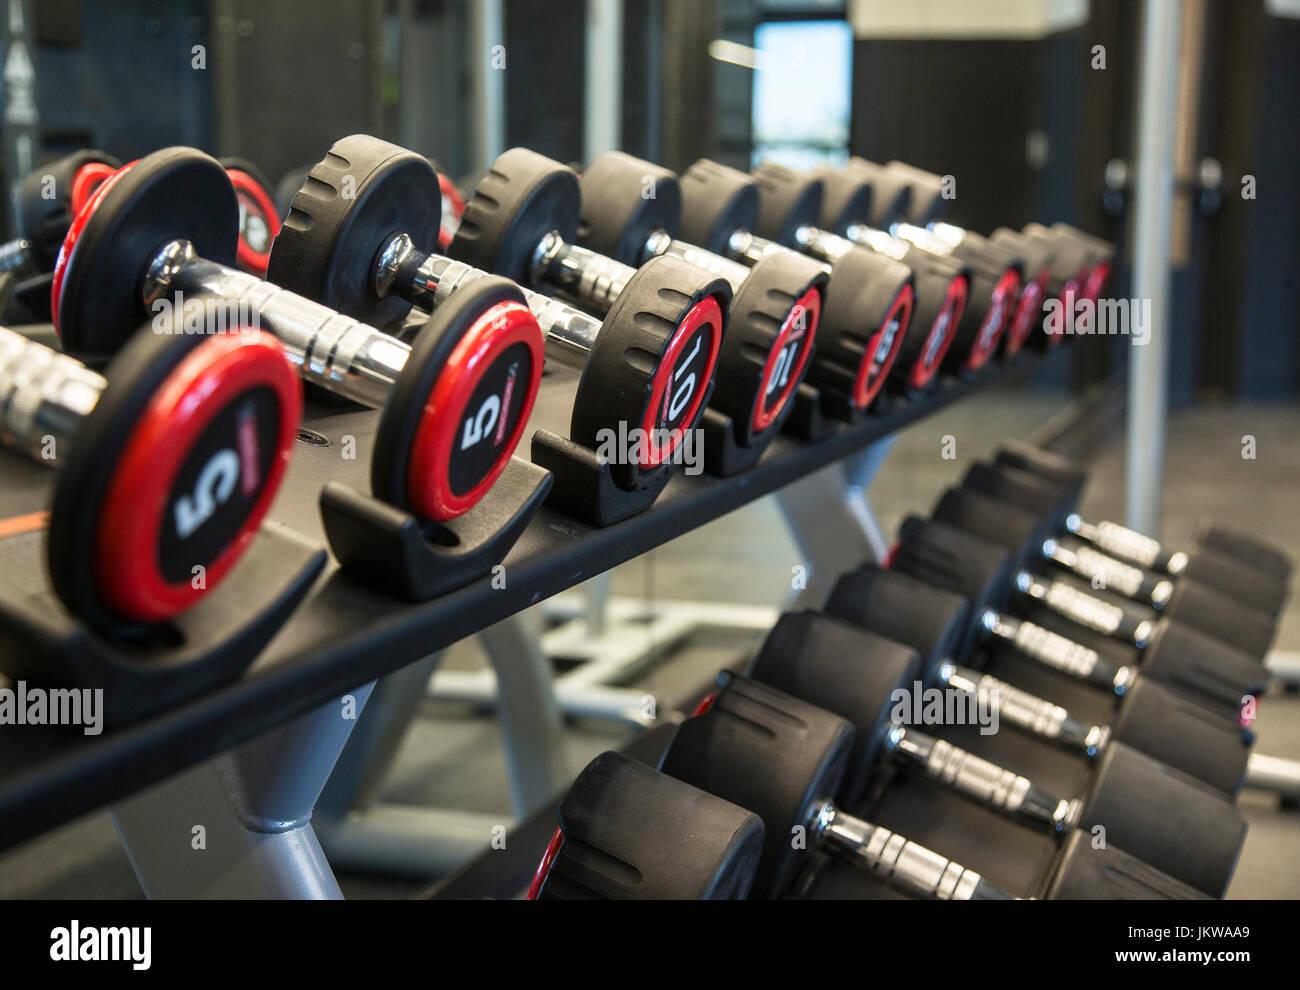 Dumbbells on a rack - Stock Image